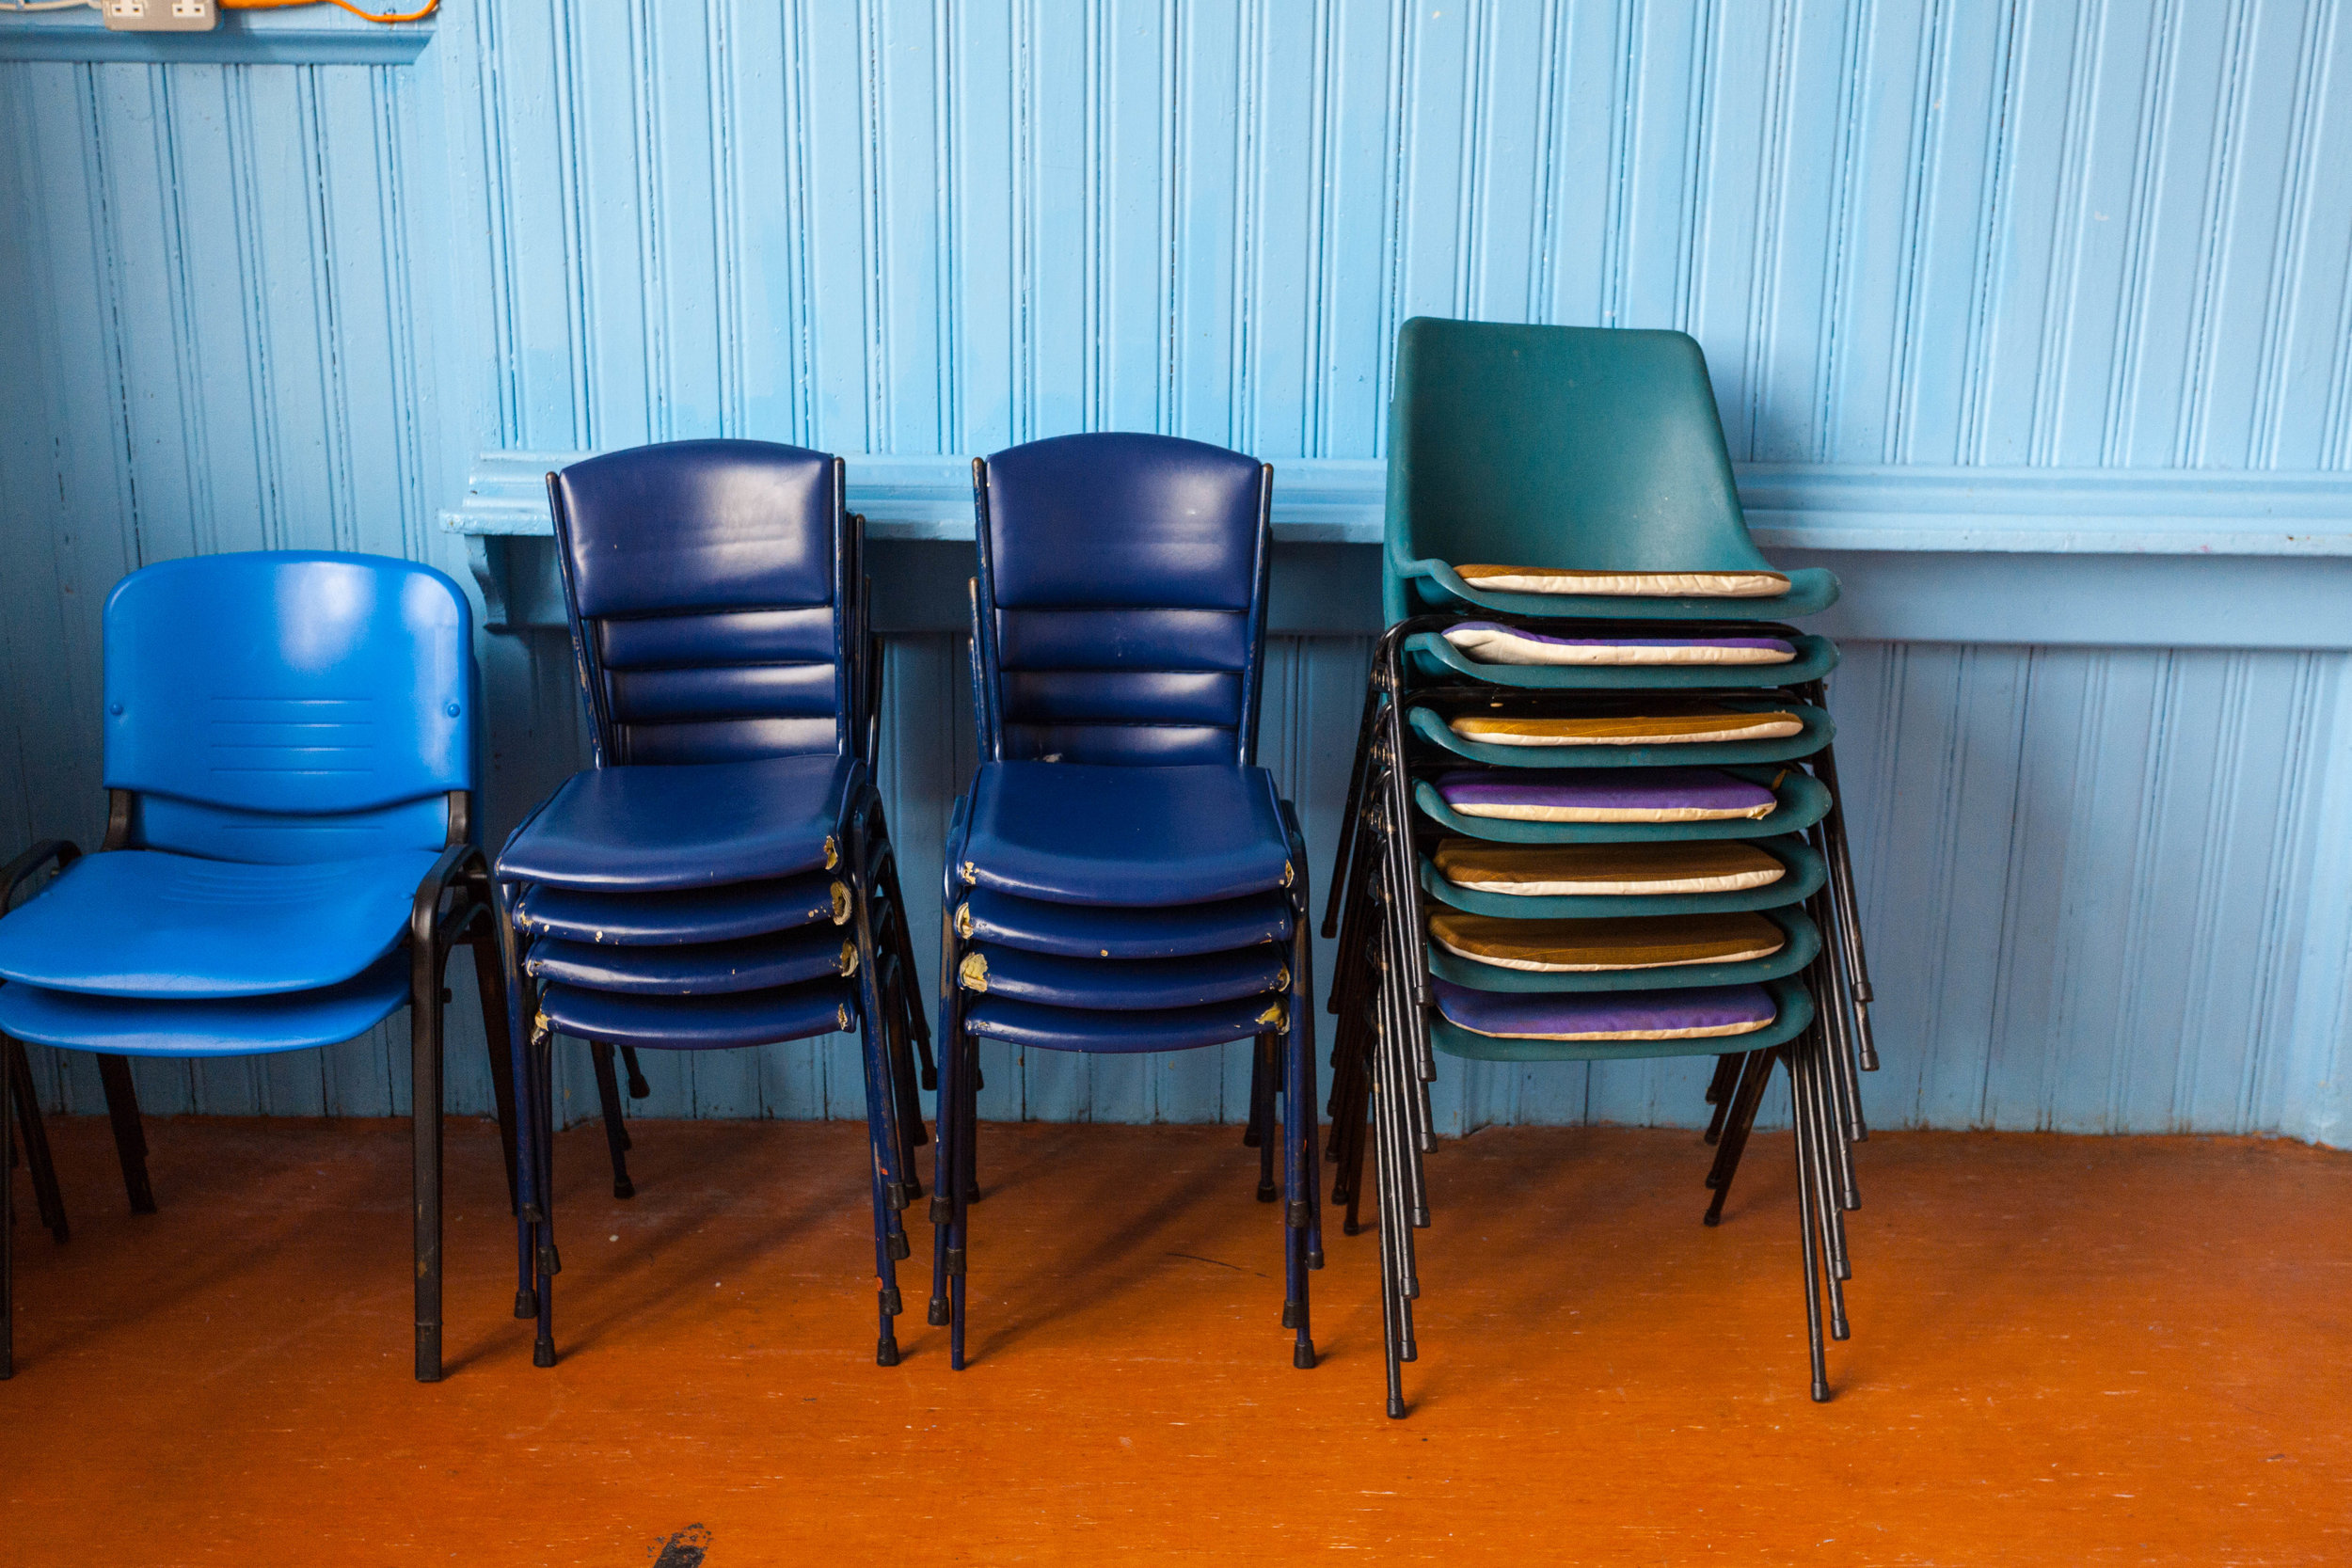 kinning-park---chairs-1_16445006435_o_29788498995_o.jpg